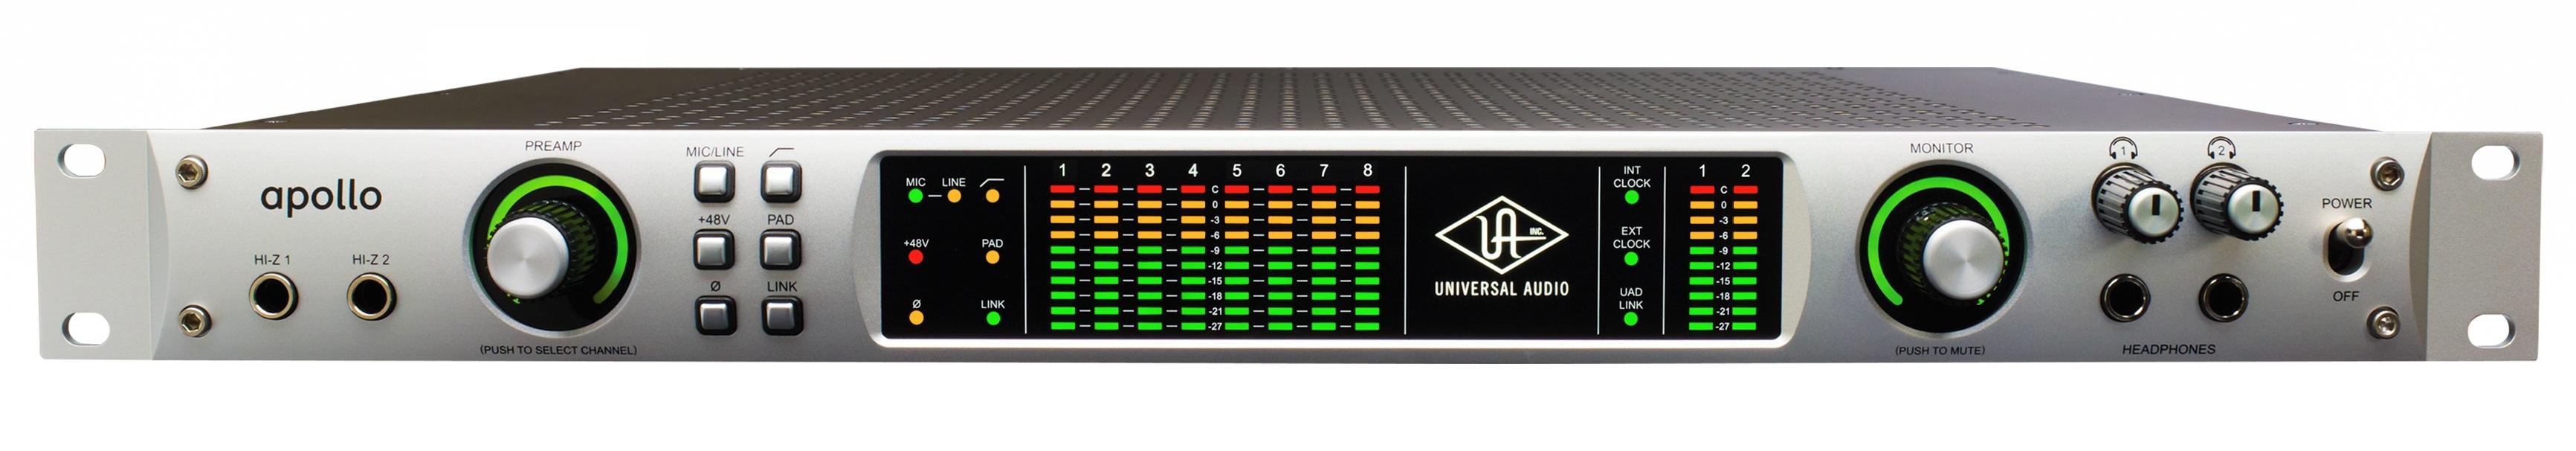 Universal Audio Apollo Quad FireWire Audio Interface with DSP